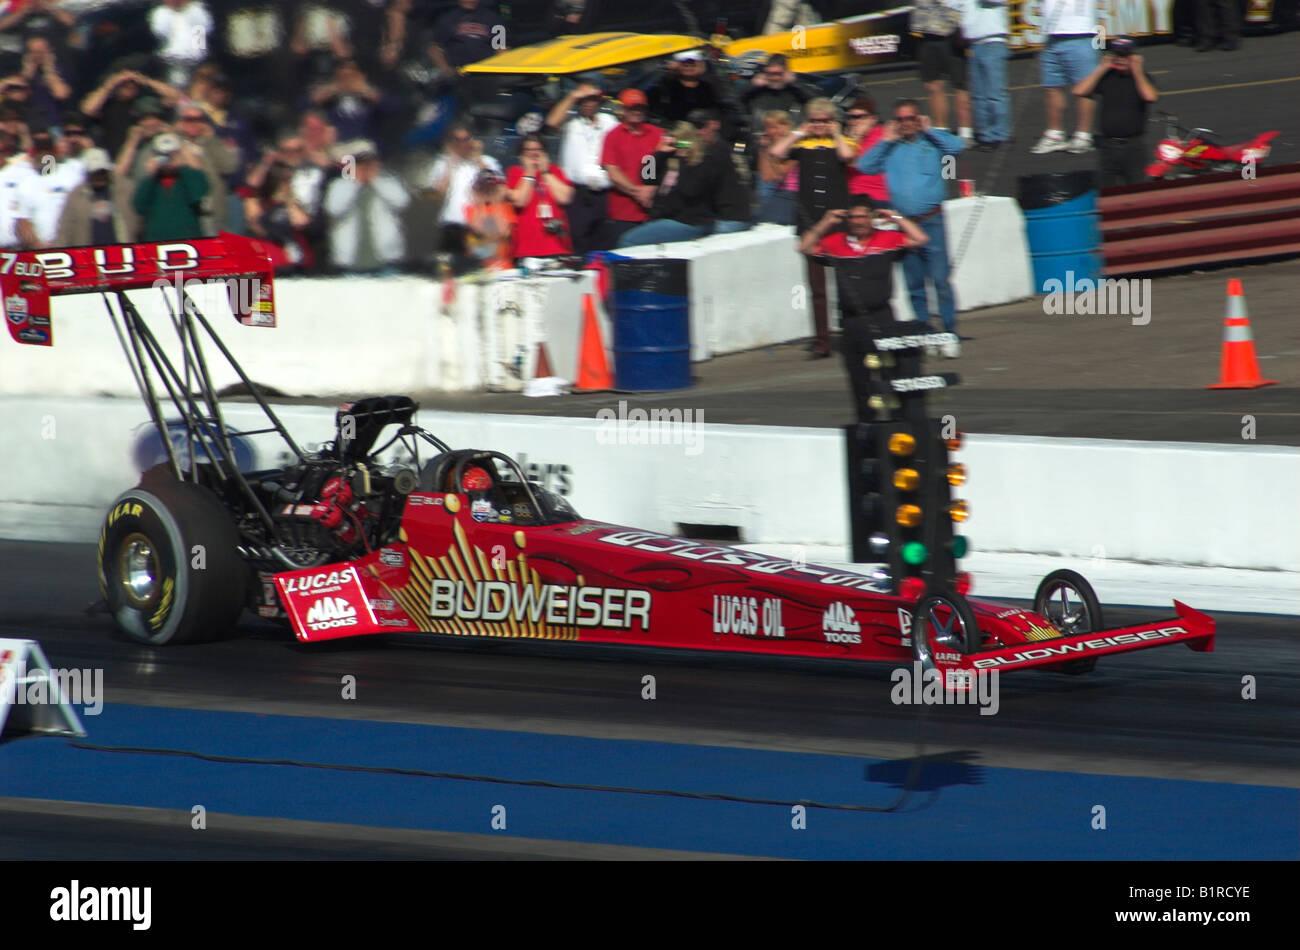 Brandon Bernstein's 'Budweiser' NHRA Top Fuel dragster - taking off from  the start line